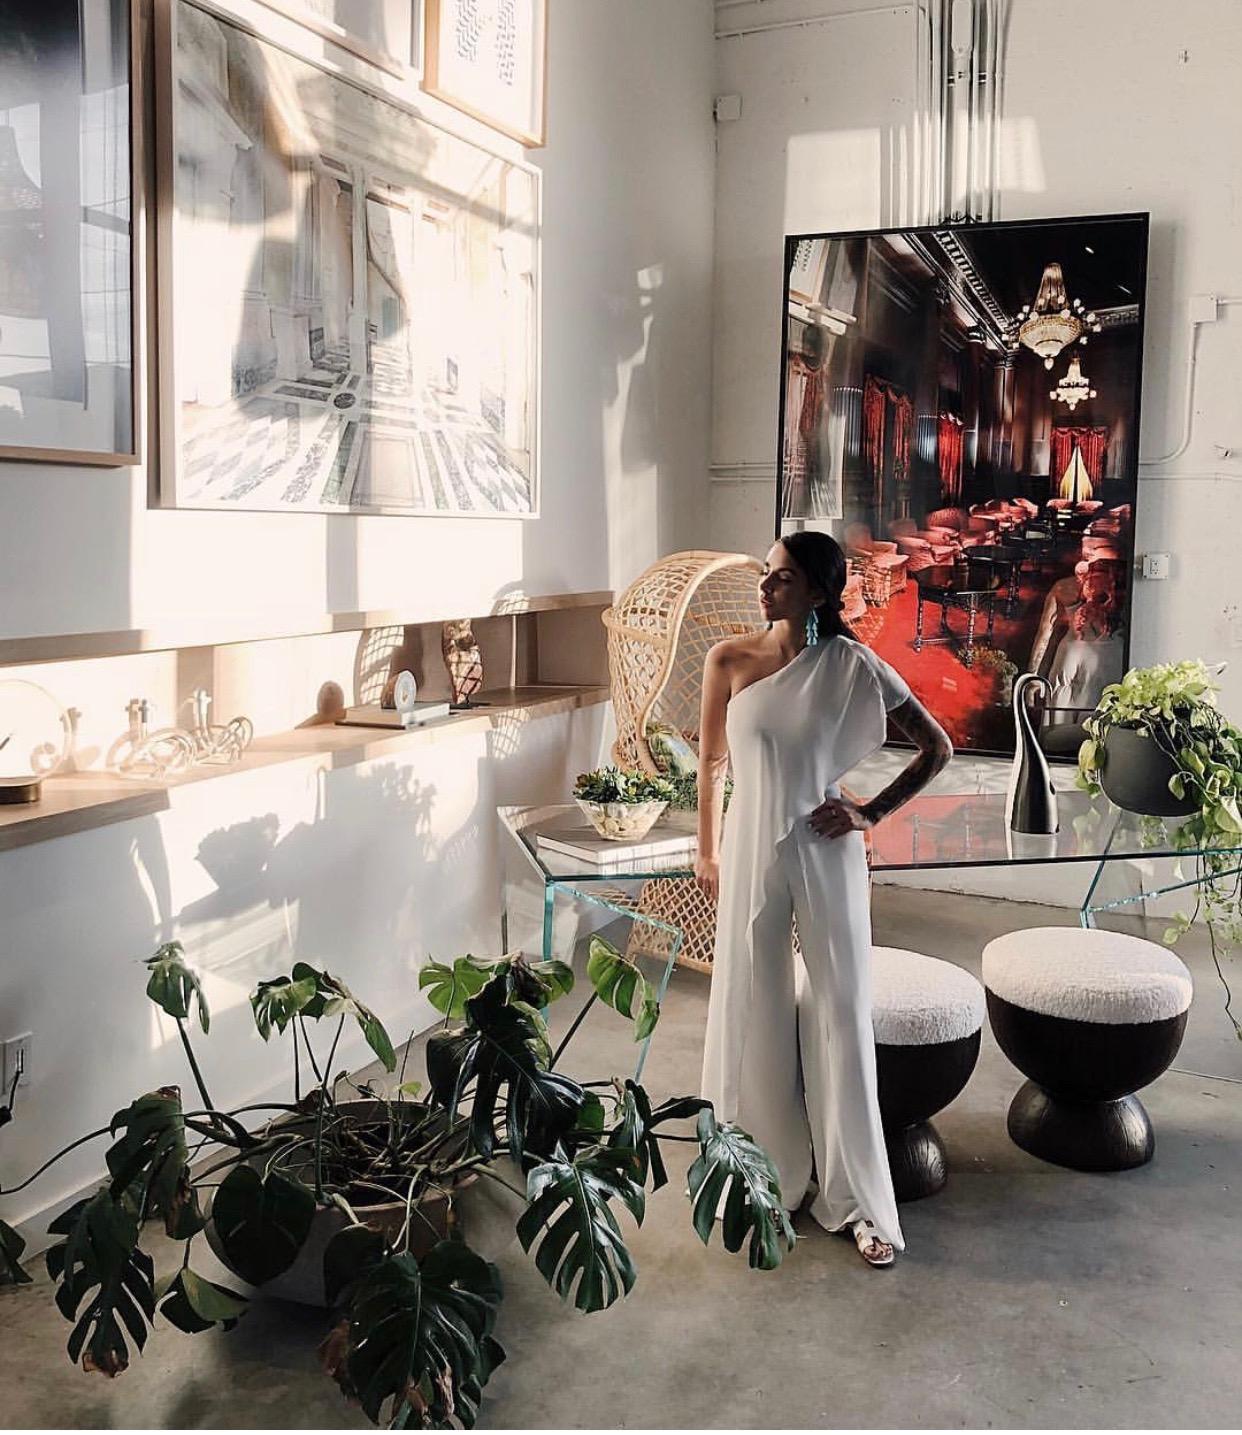 Ashley Ramos, Cur8 Gallery Director and CEO